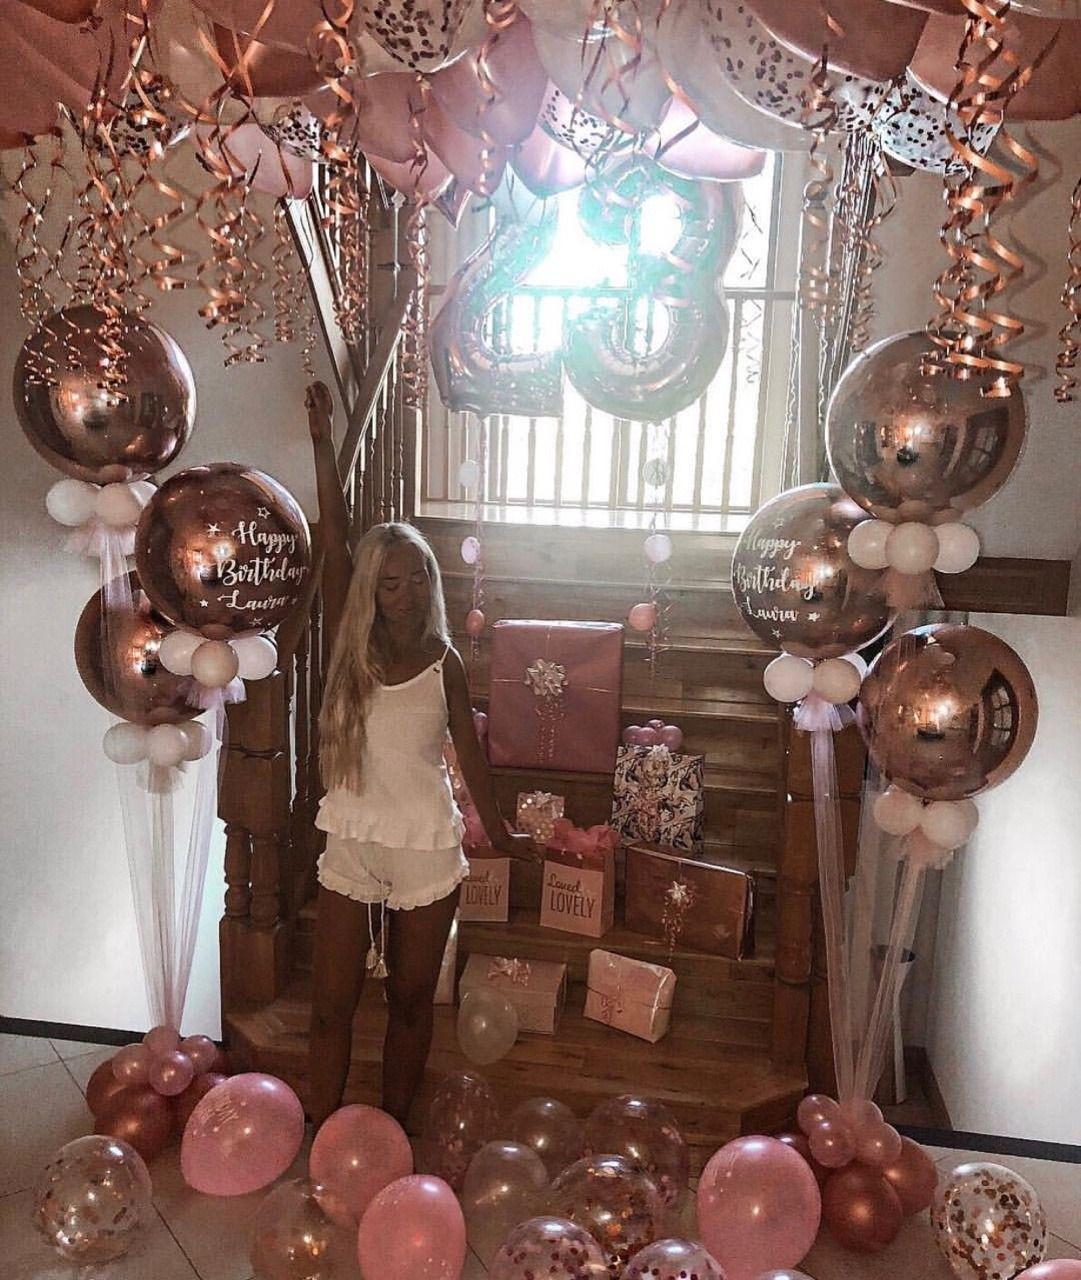 Pinterest Itskiraababe 23rd Birthday Decorations 18th Birthday Party Birthday Goals